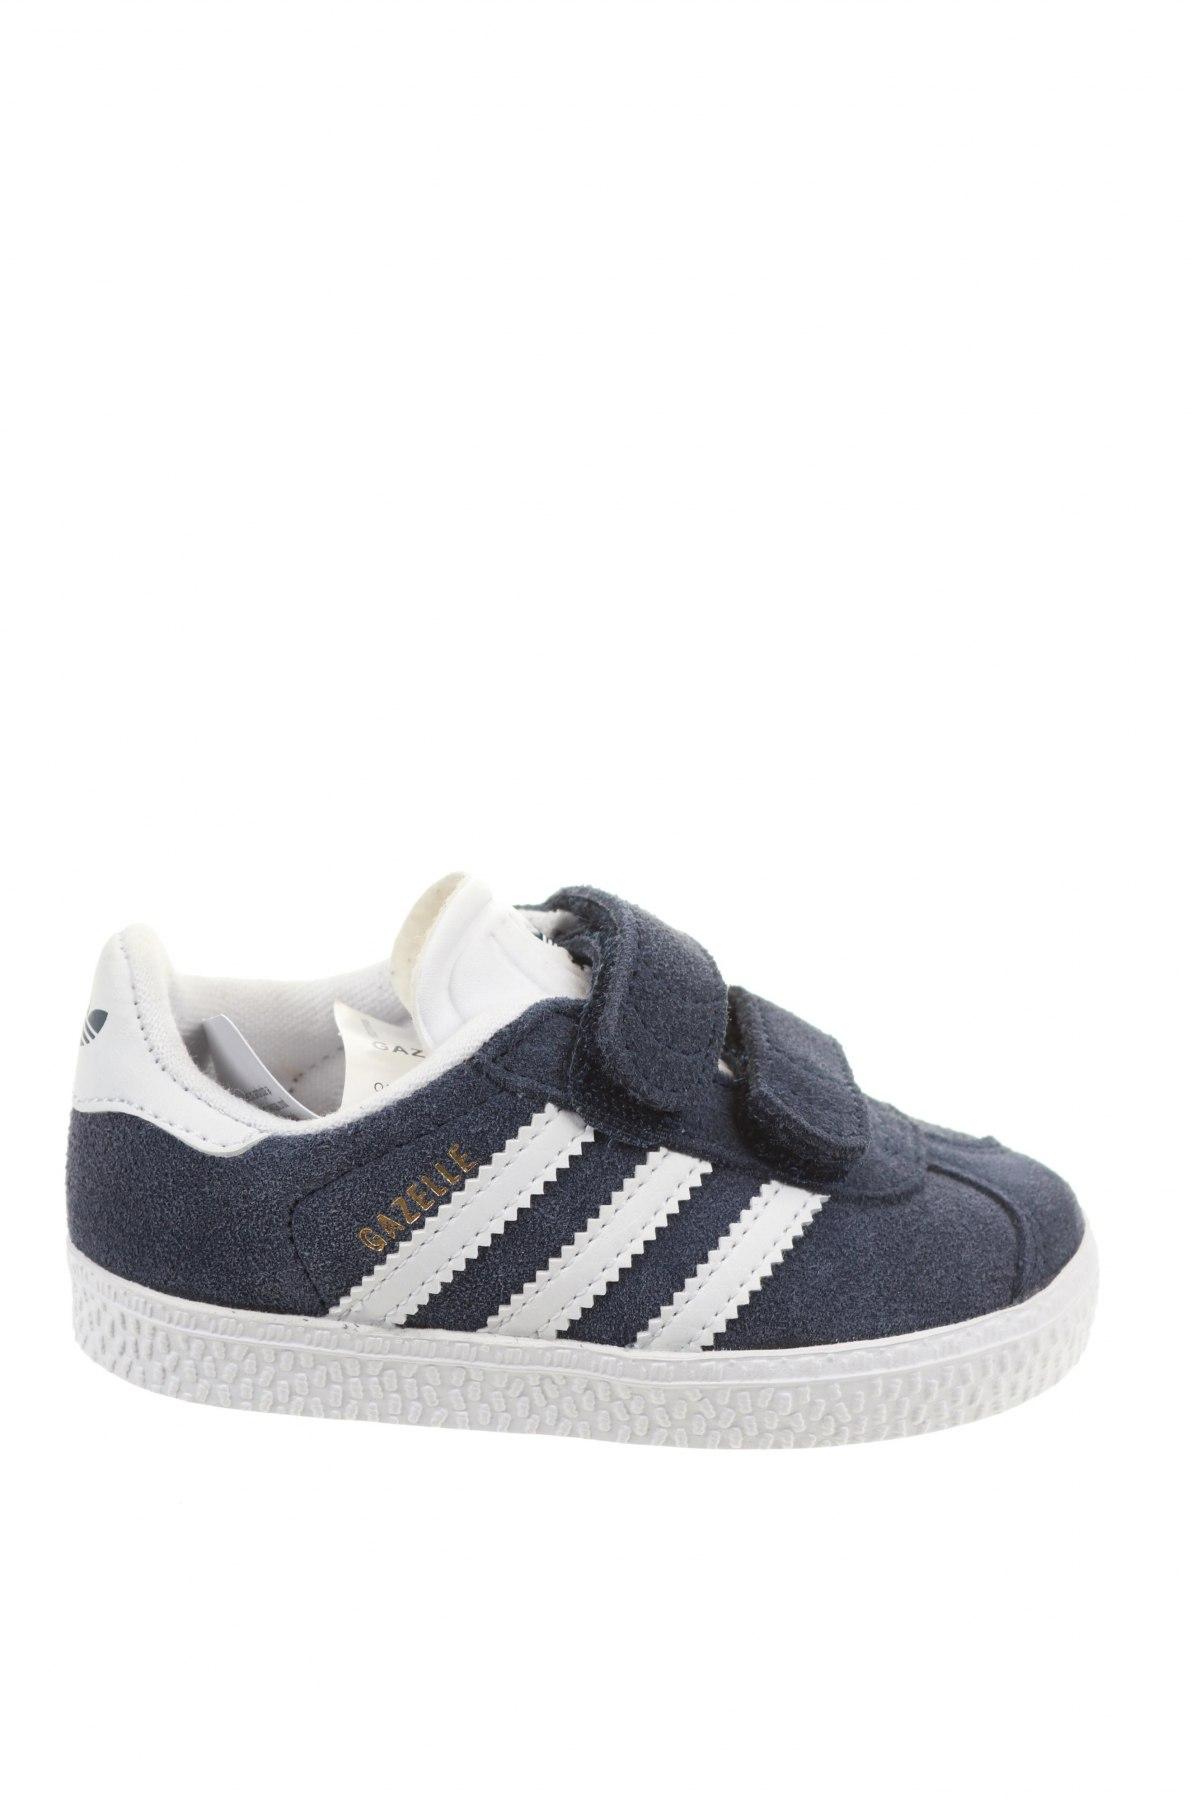 Детски обувки Adidas Originals, Размер 21, Цвят Син, Естествен велур, Цена 47,60лв.